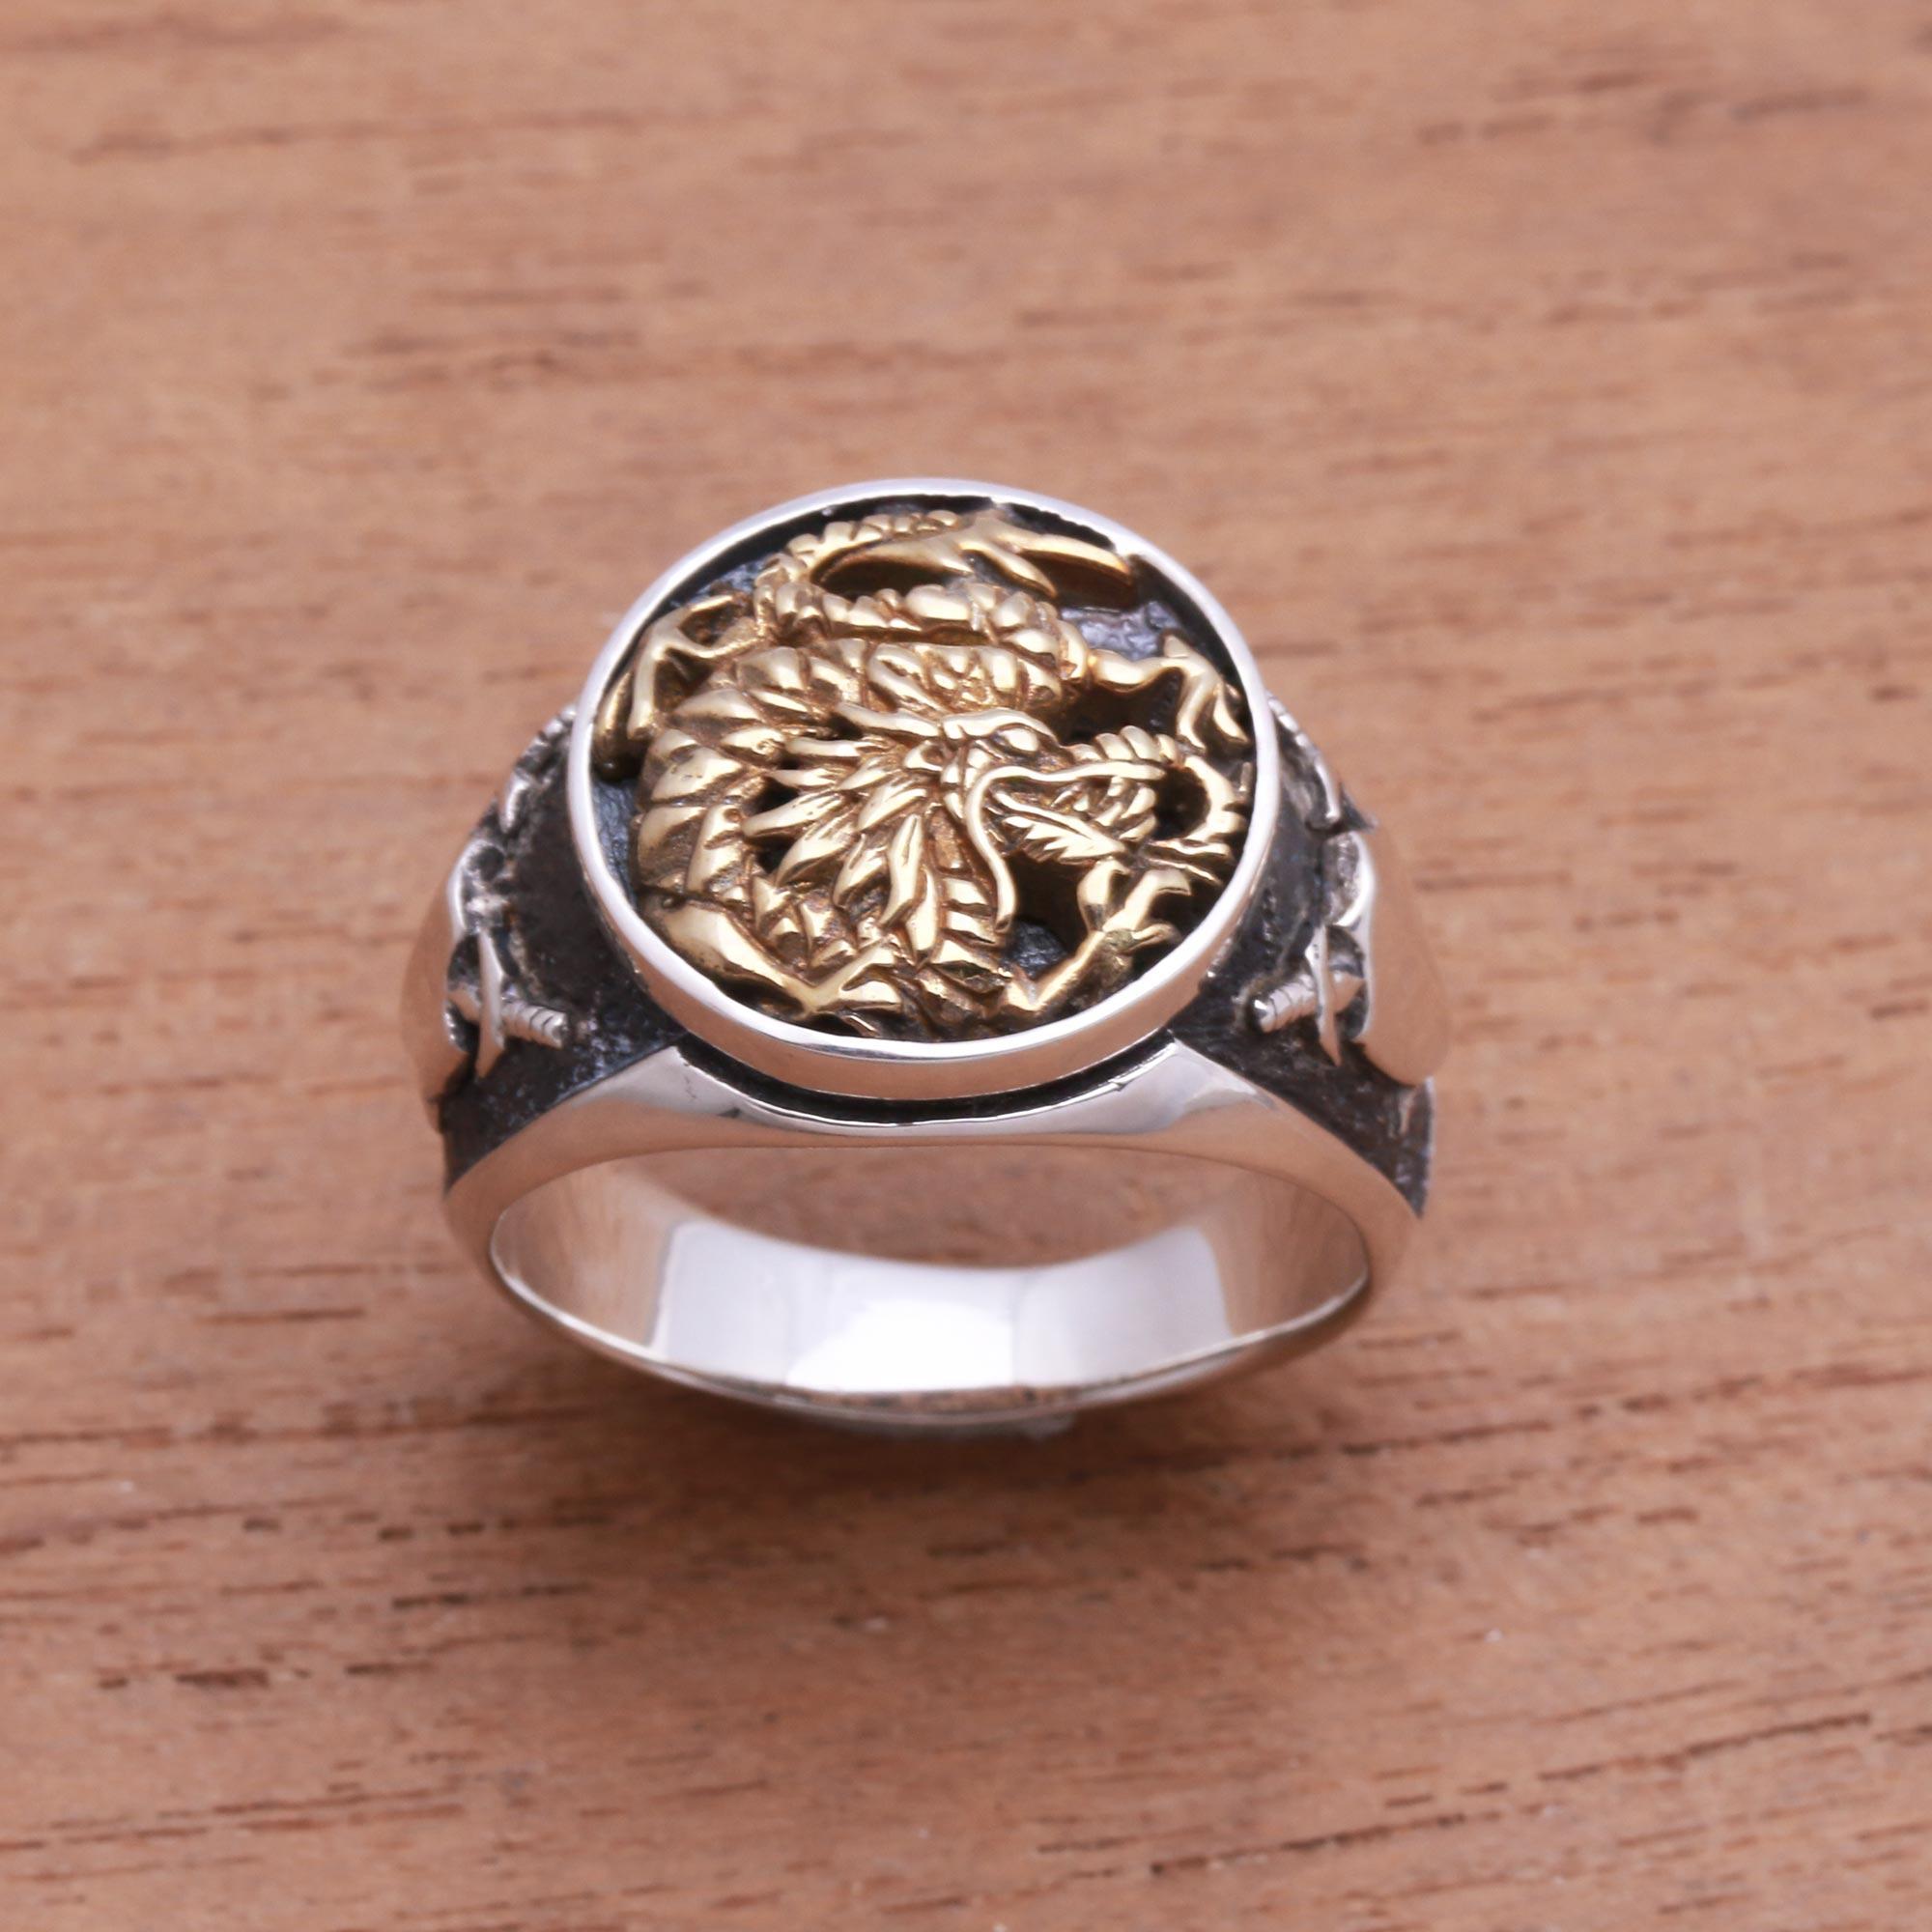 Royal Bali Handmade Dragon Bypass Ring for Women Sterling Silver